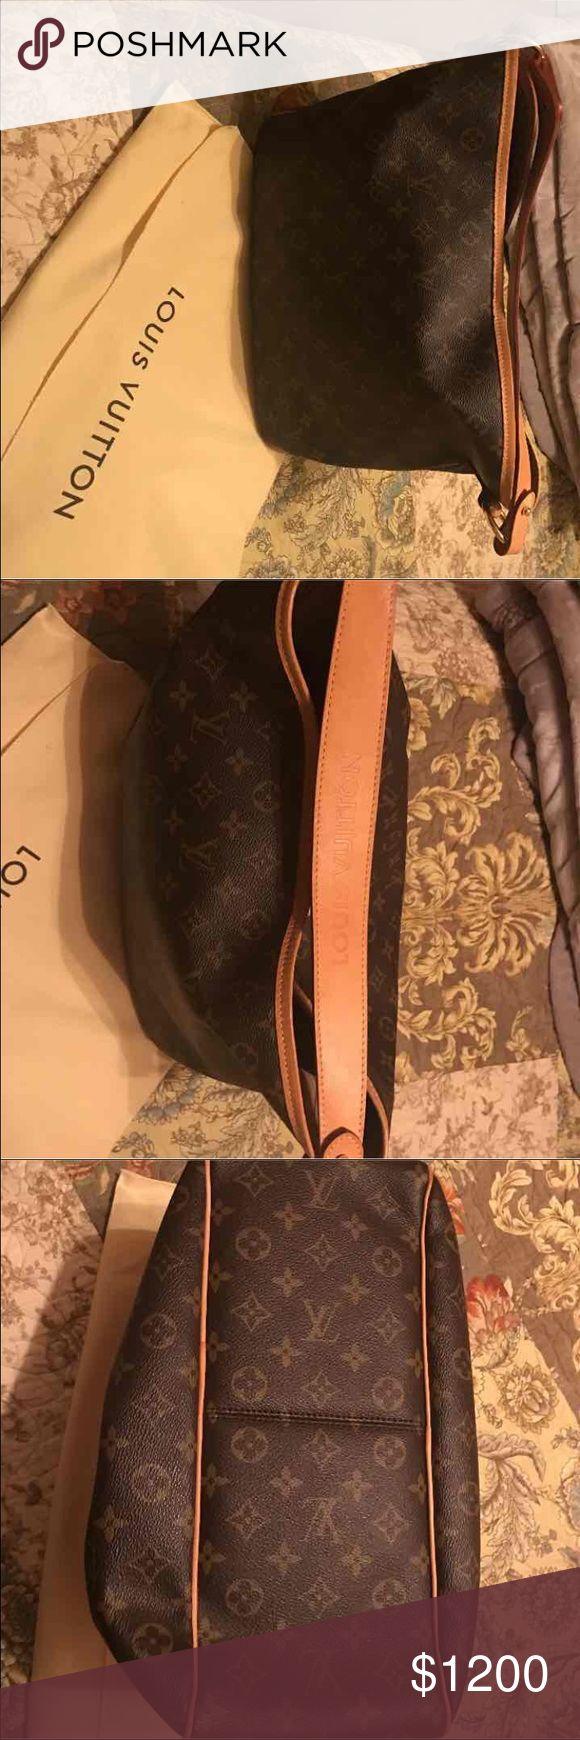 Louis Vuitton monogram delightful shoulder bag Authentic Louis Vuitton monogram delightful shoulder bag lightly used retail $1390 plus taxes close $1500.00 Louis Vuitton Bags Shoulder Bags